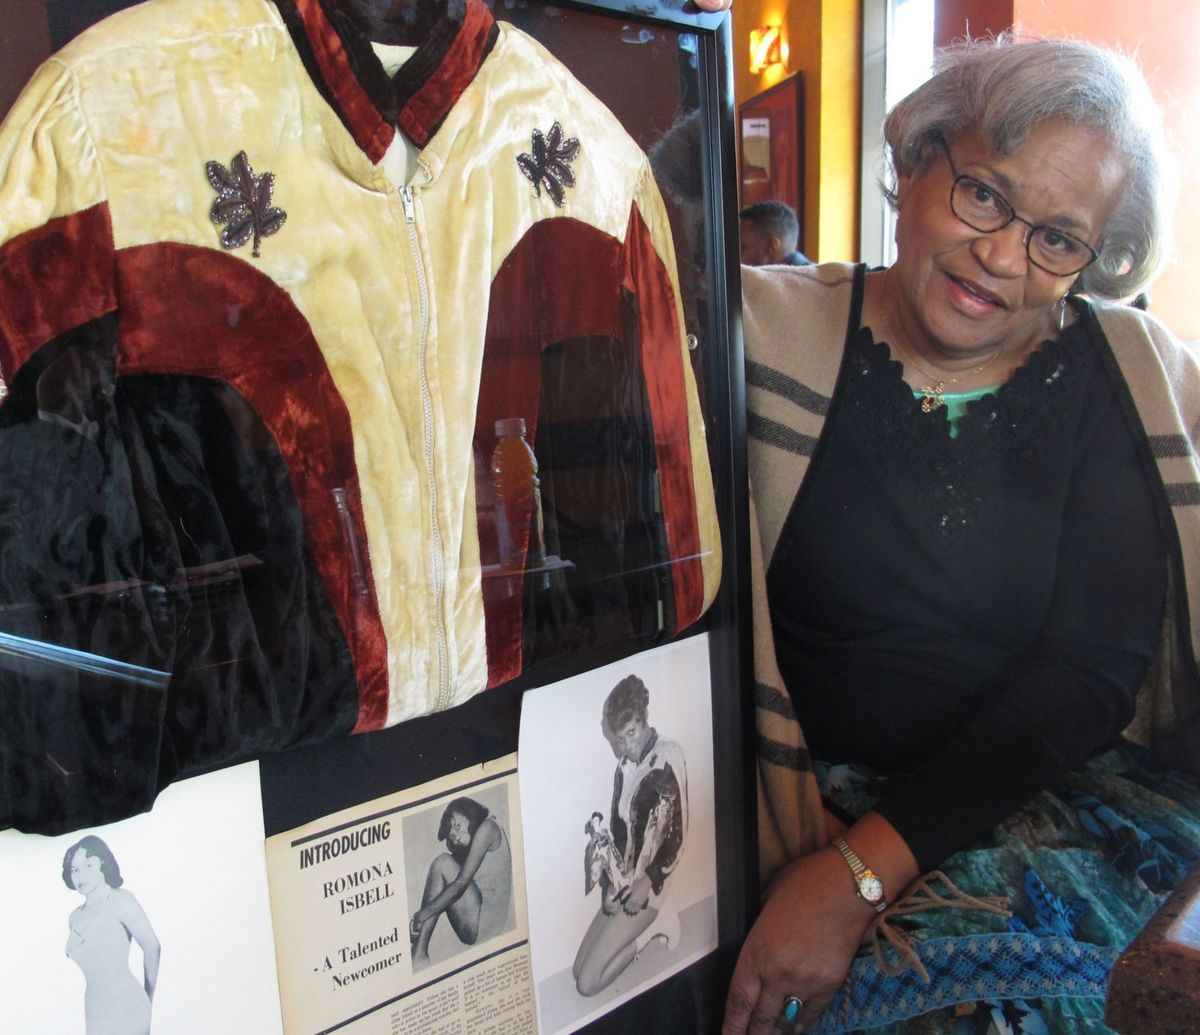 African American History, African American Wrestler, Woman Wrestler, Black History, Ramona Isbell, KOLUMN Magazine, KOLUMN